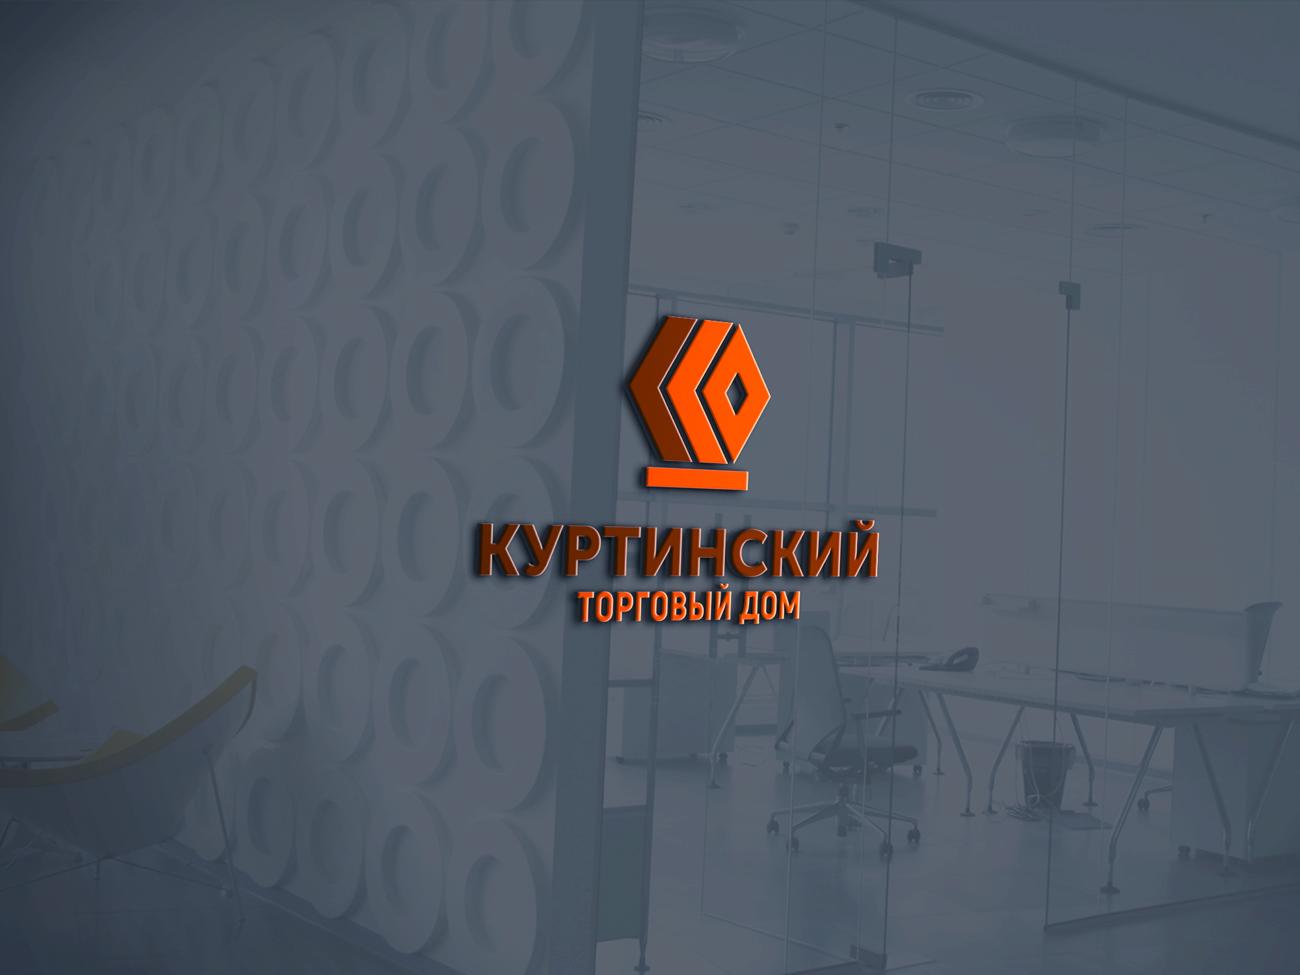 Логотип для камнедобывающей компании фото f_6545b9fad06c61bd.jpg